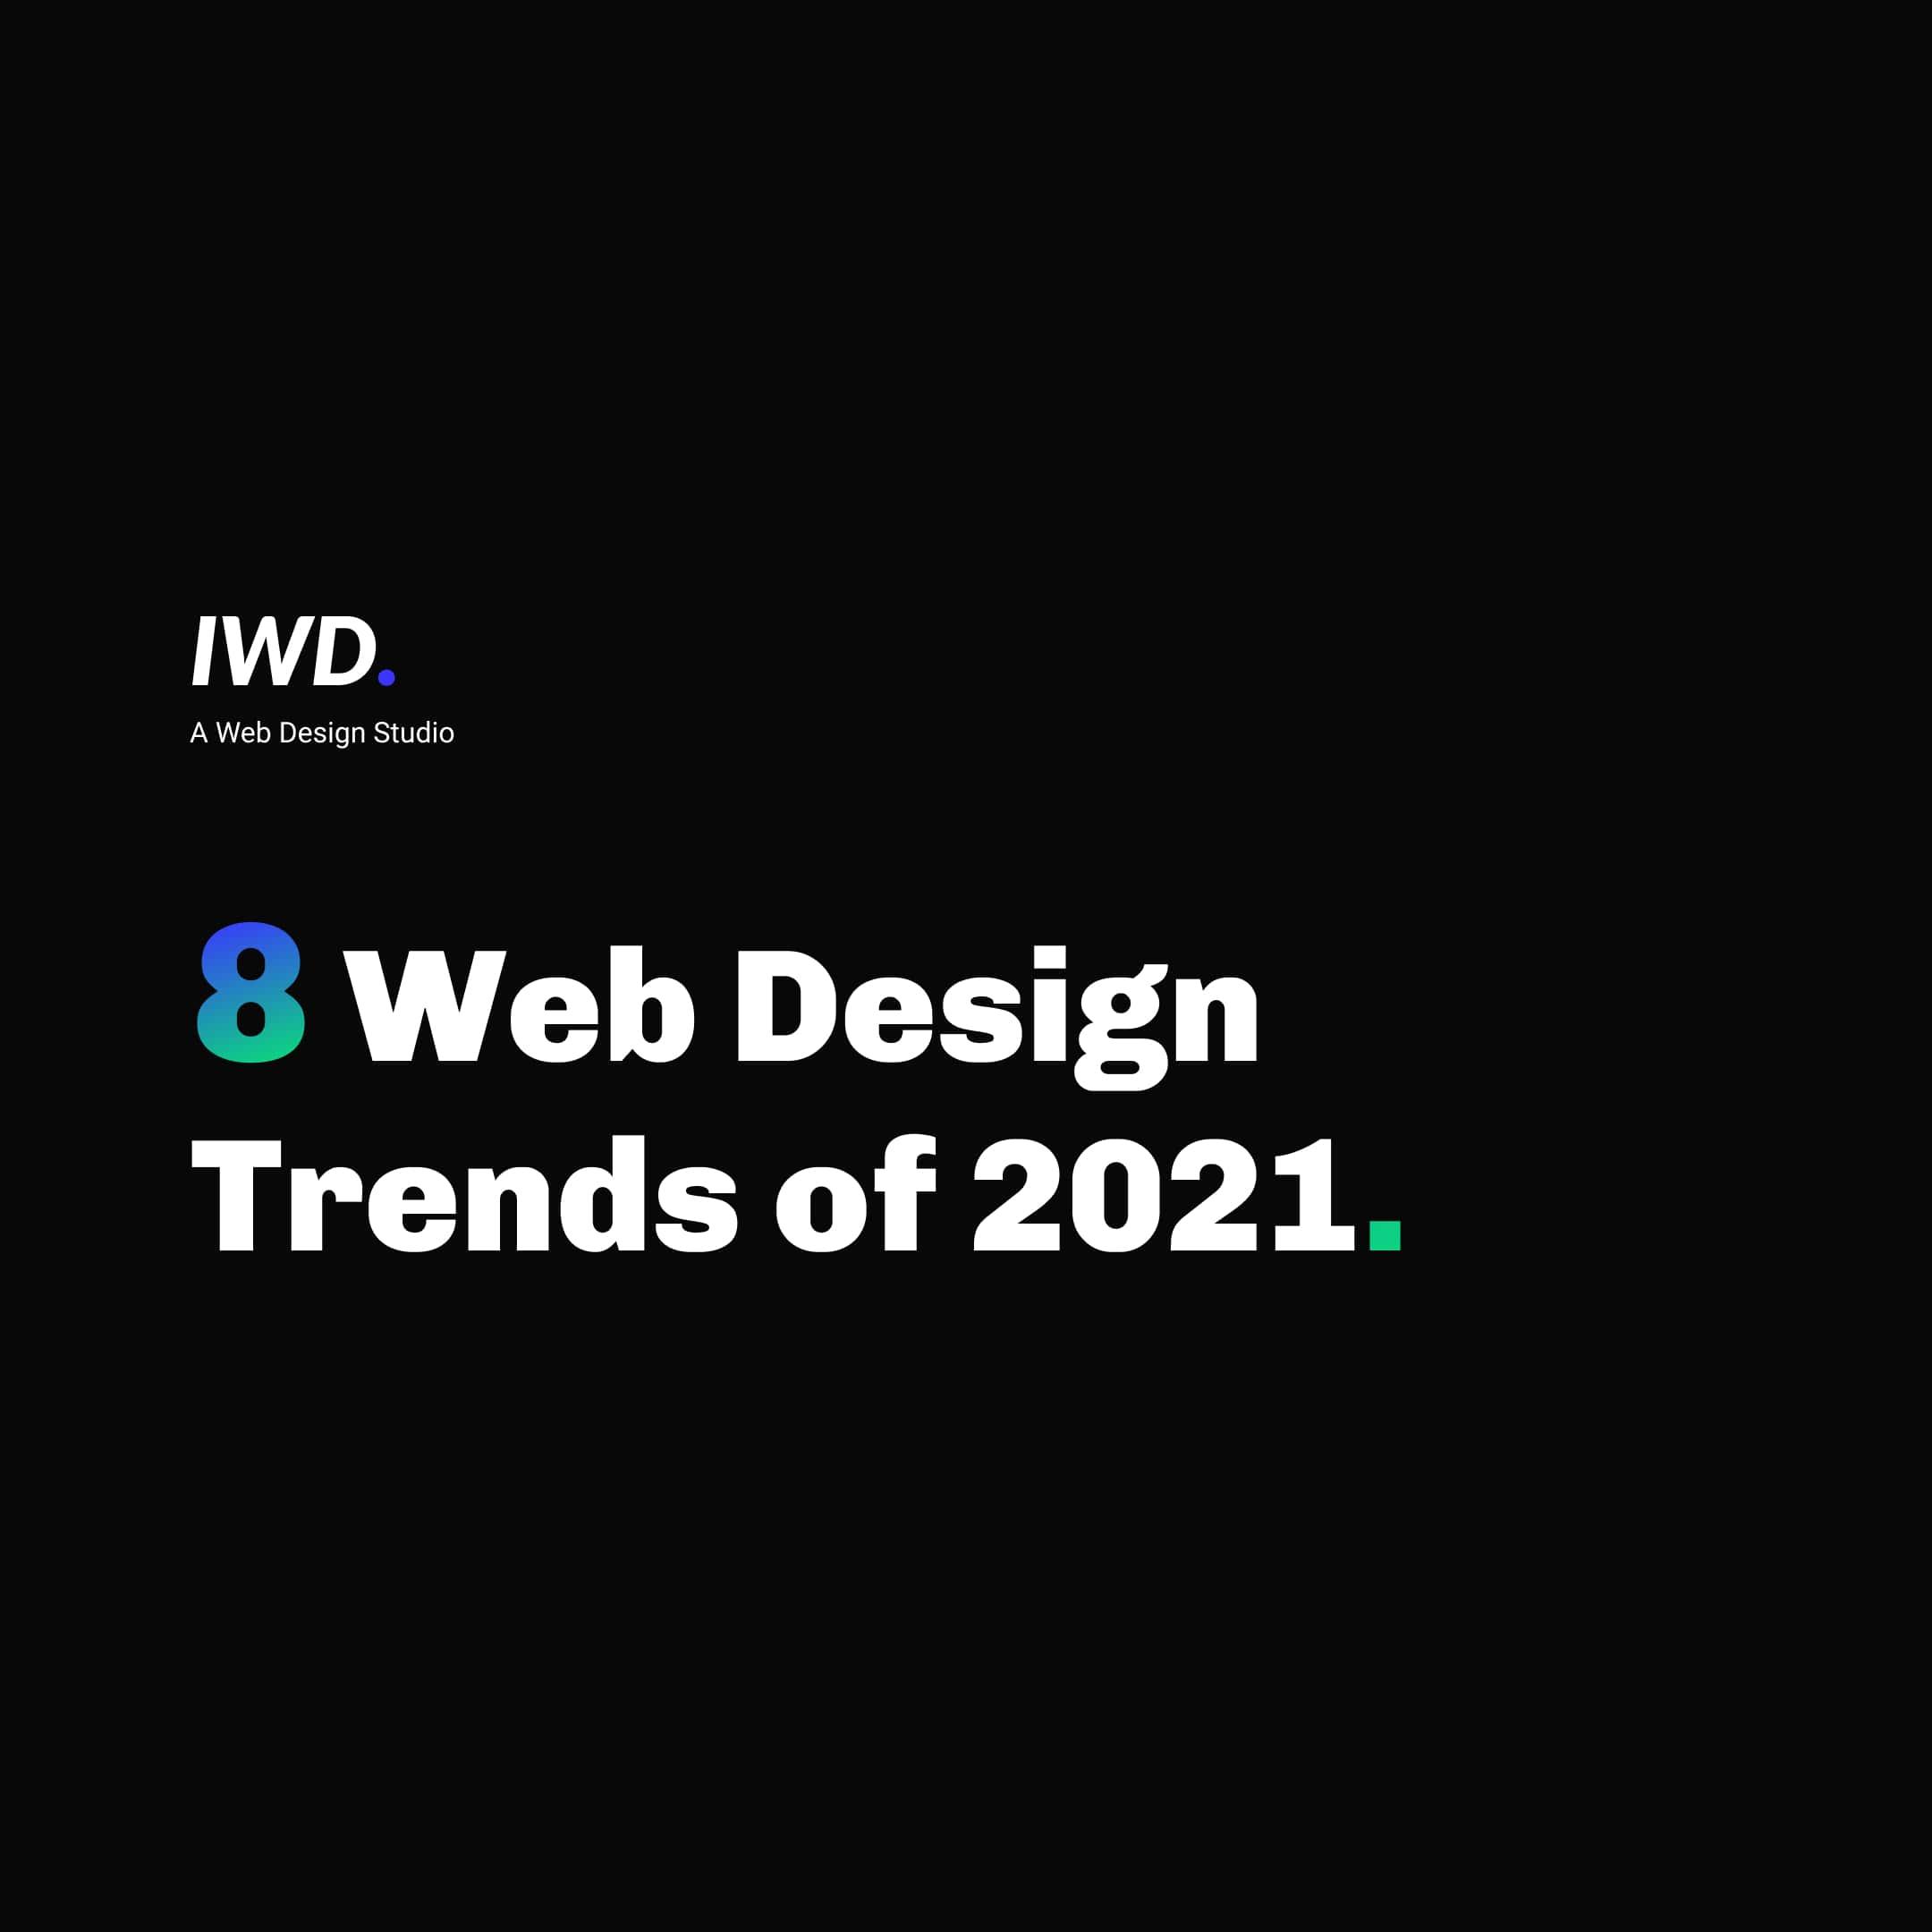 8 Modern Web Design Trends in 2021